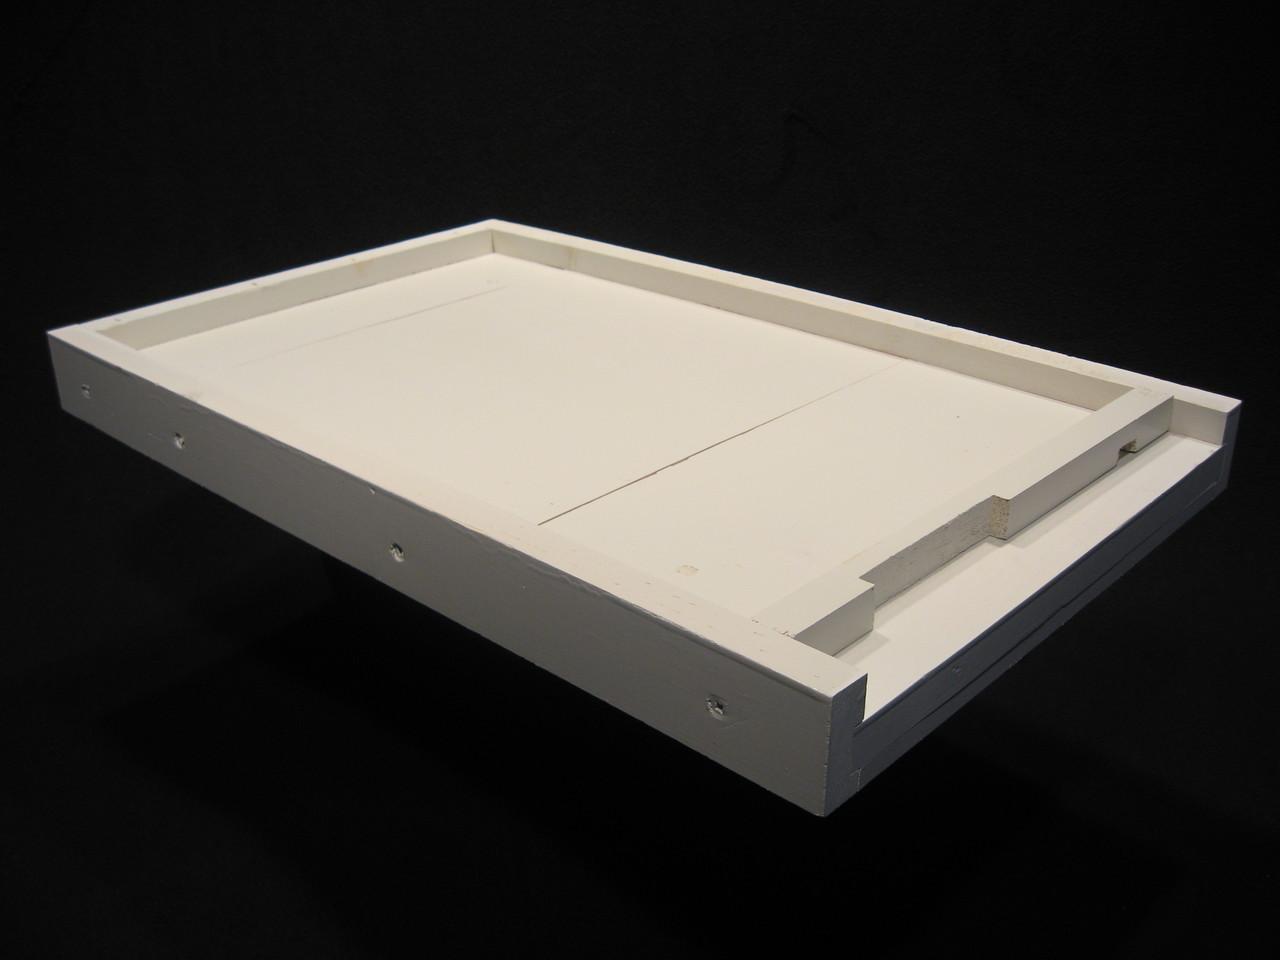 Assembled/Painted 8 frame lid, inner cover, bottom board combo